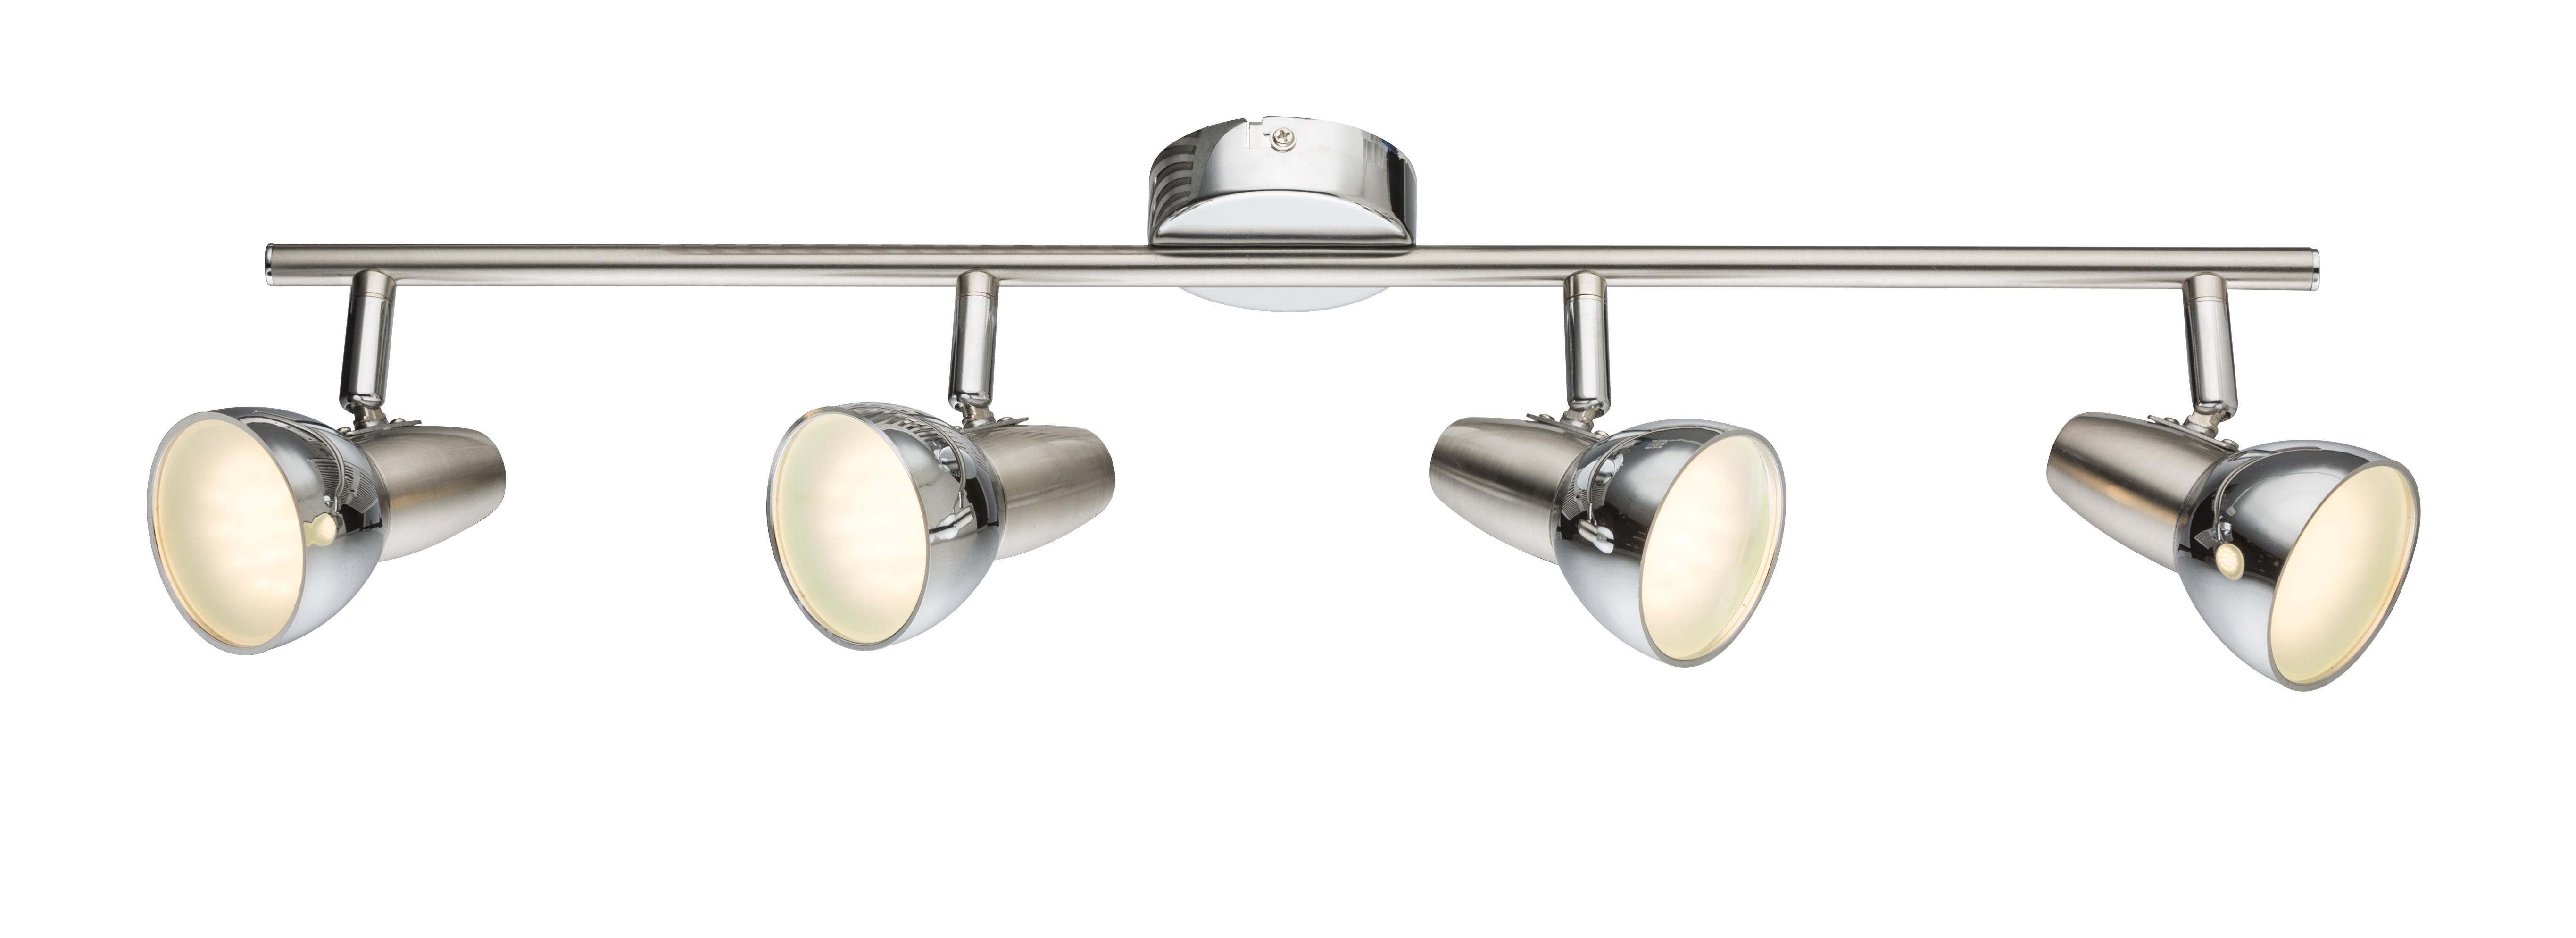 купить Настенно-потолочный светильник Настенно-потолочный светильник Cappuccino по цене 6620 рублей